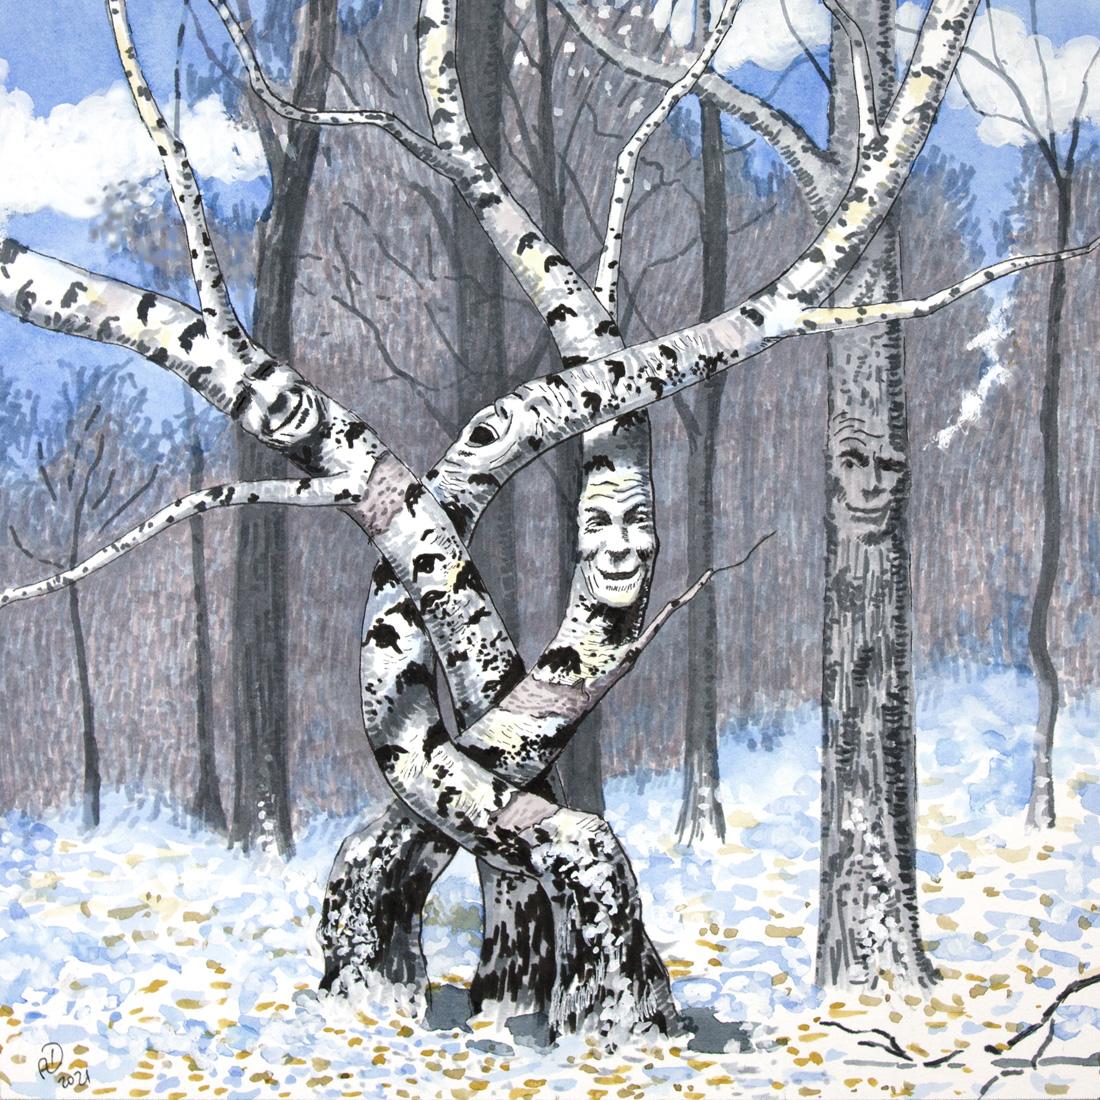 drawing mixed media art tree birch winter forest joke laughter